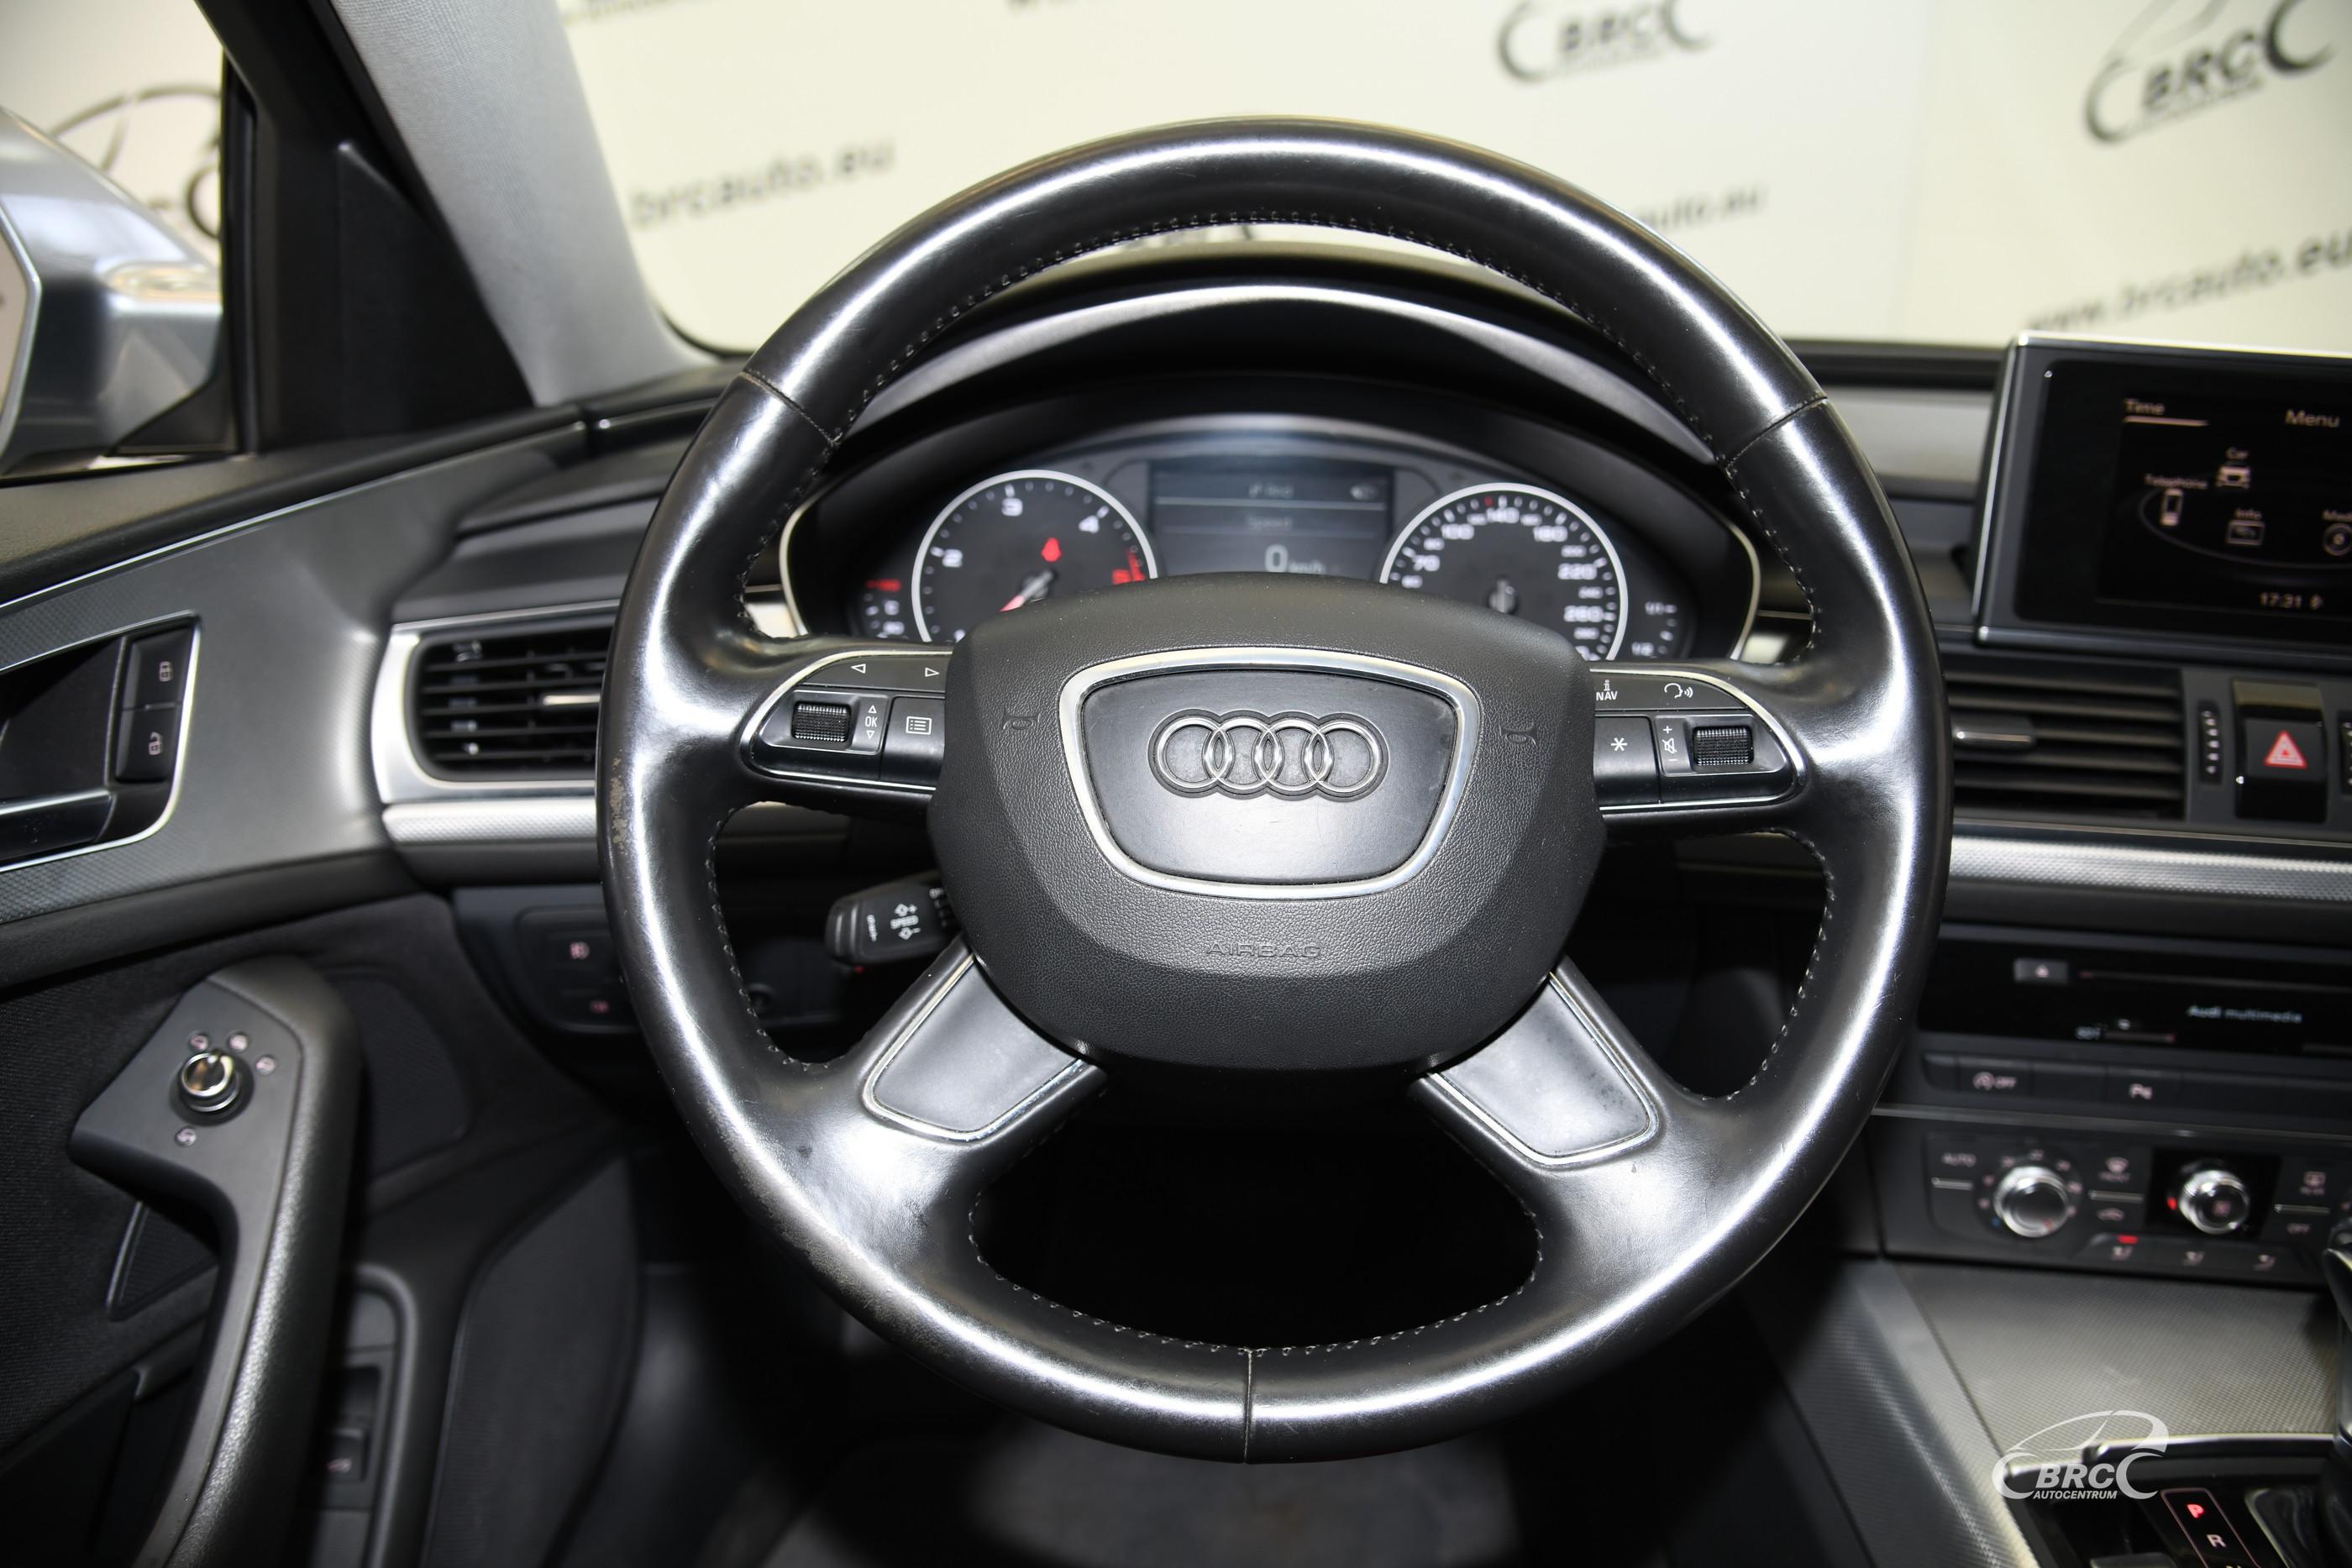 Audi A6 Avant 3.0 TDI Automatas